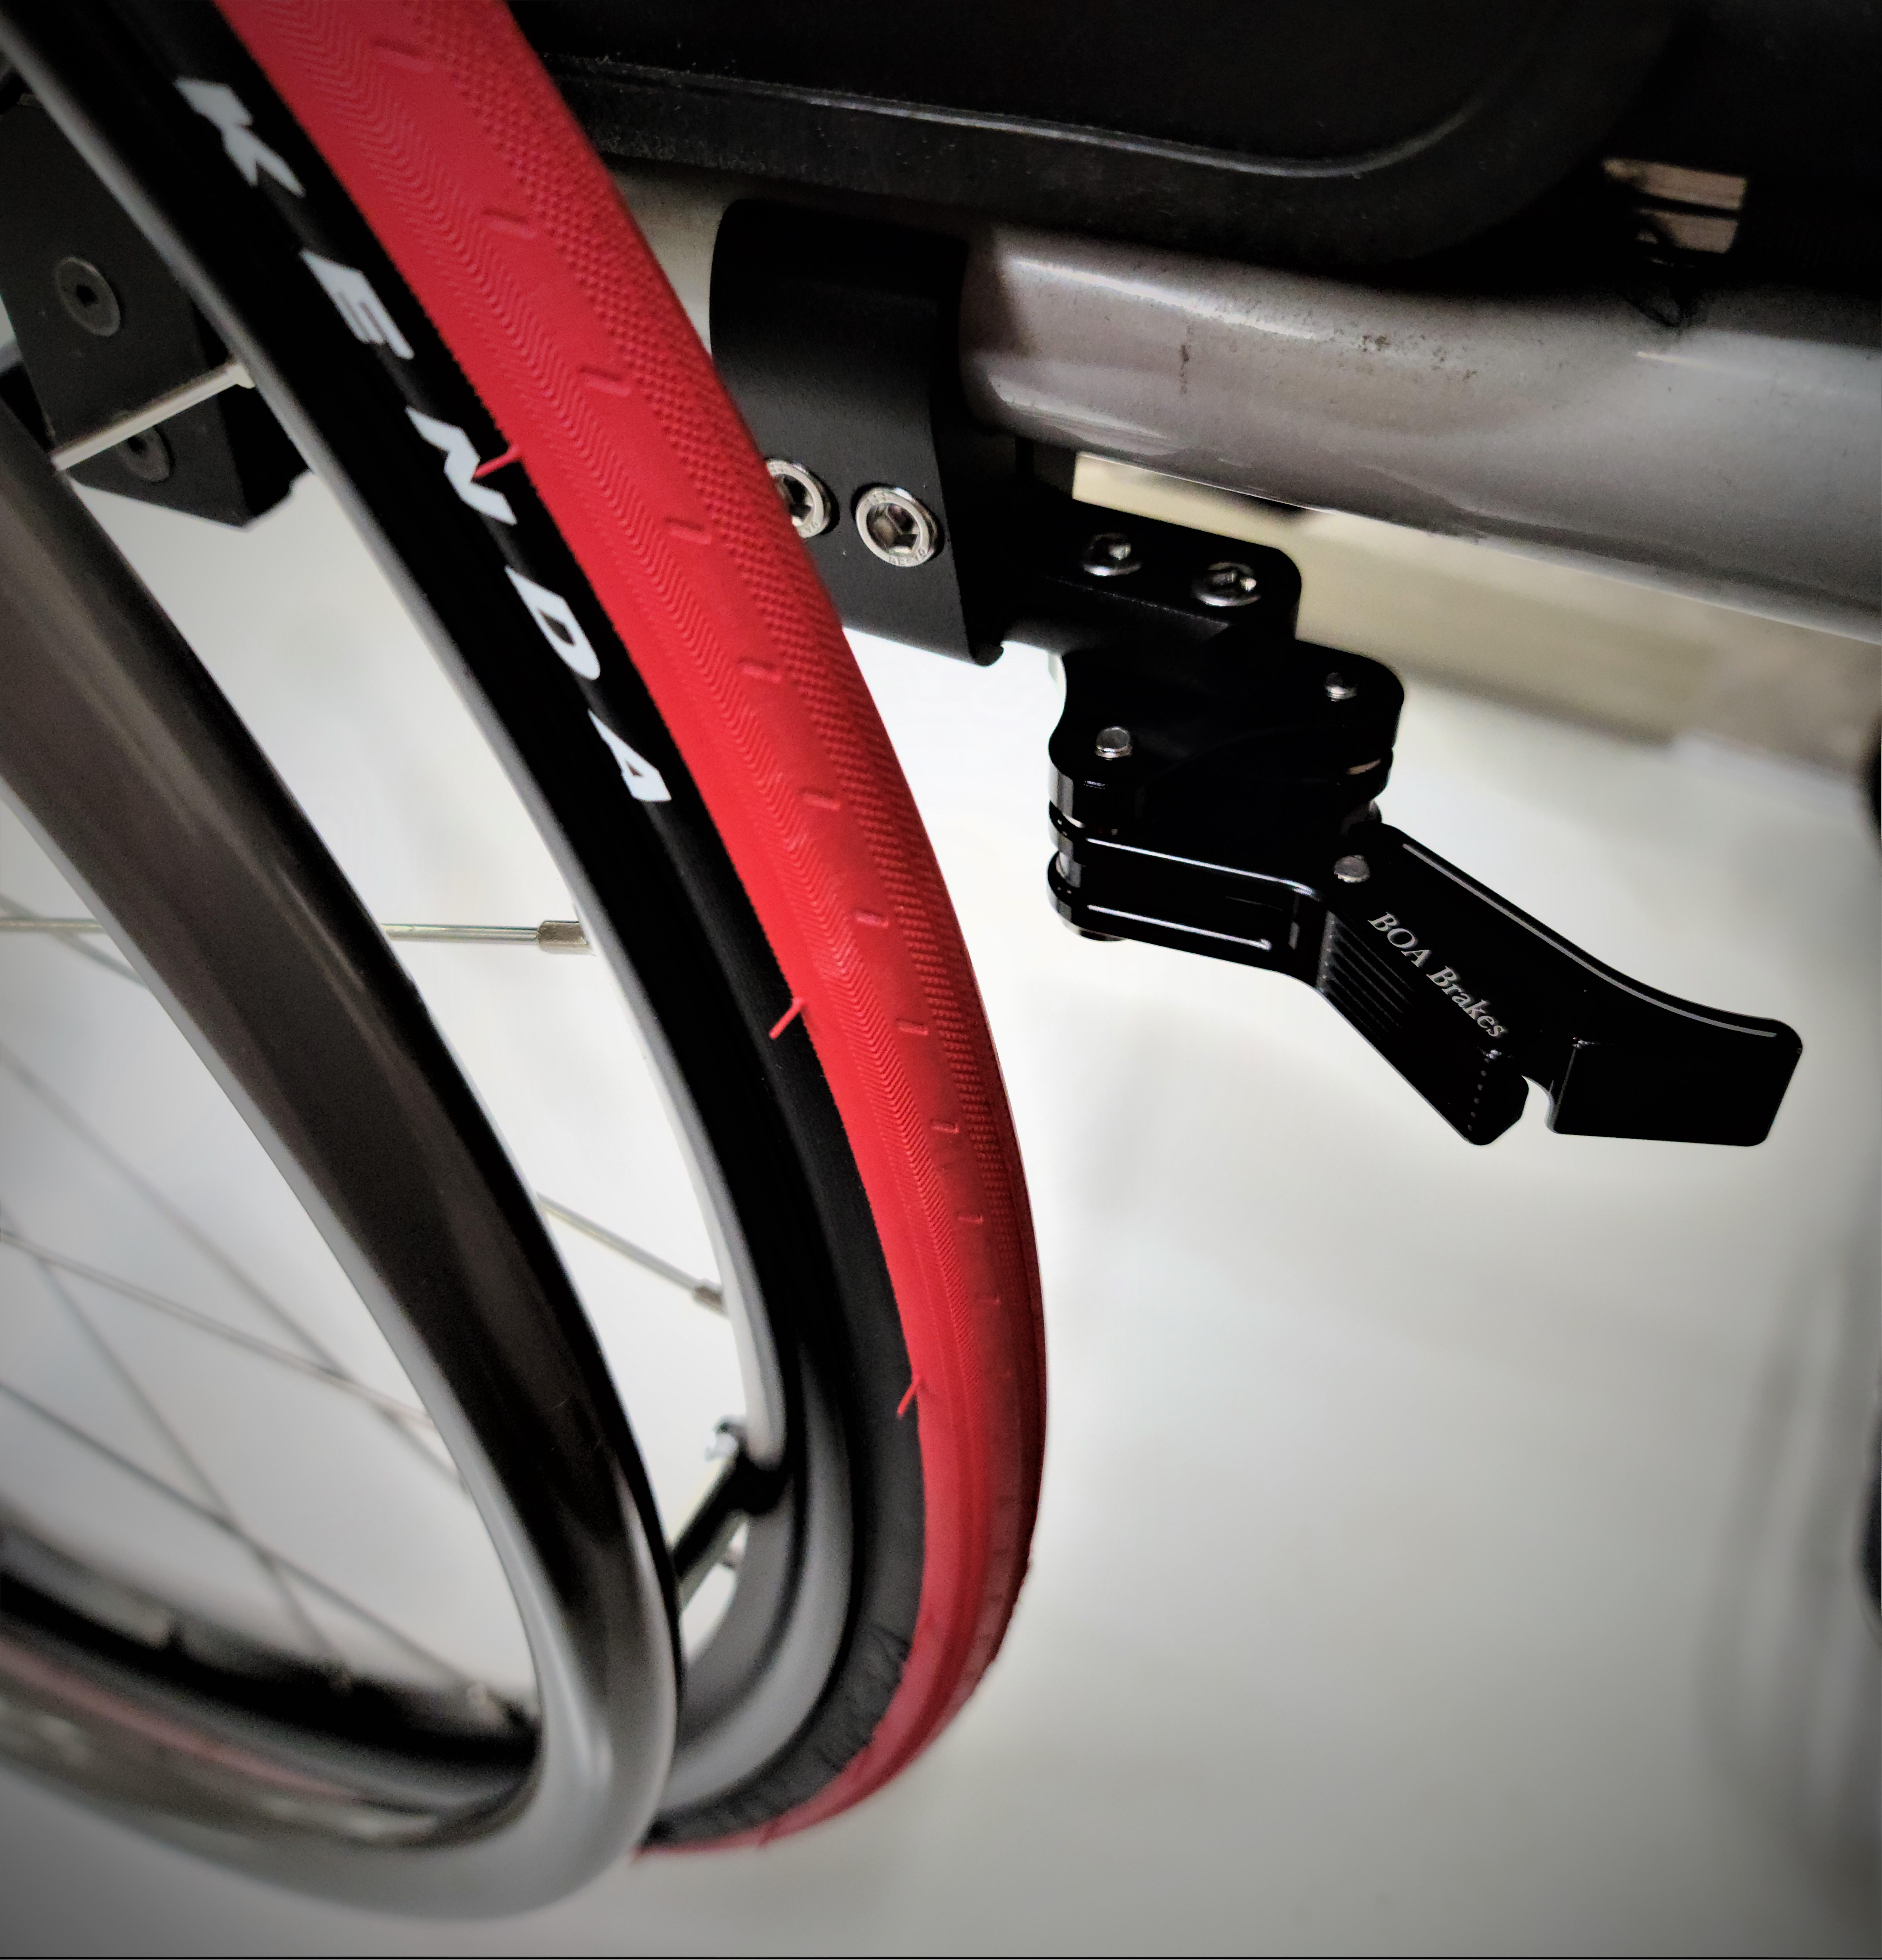 boa-branded-red-tire.jpg